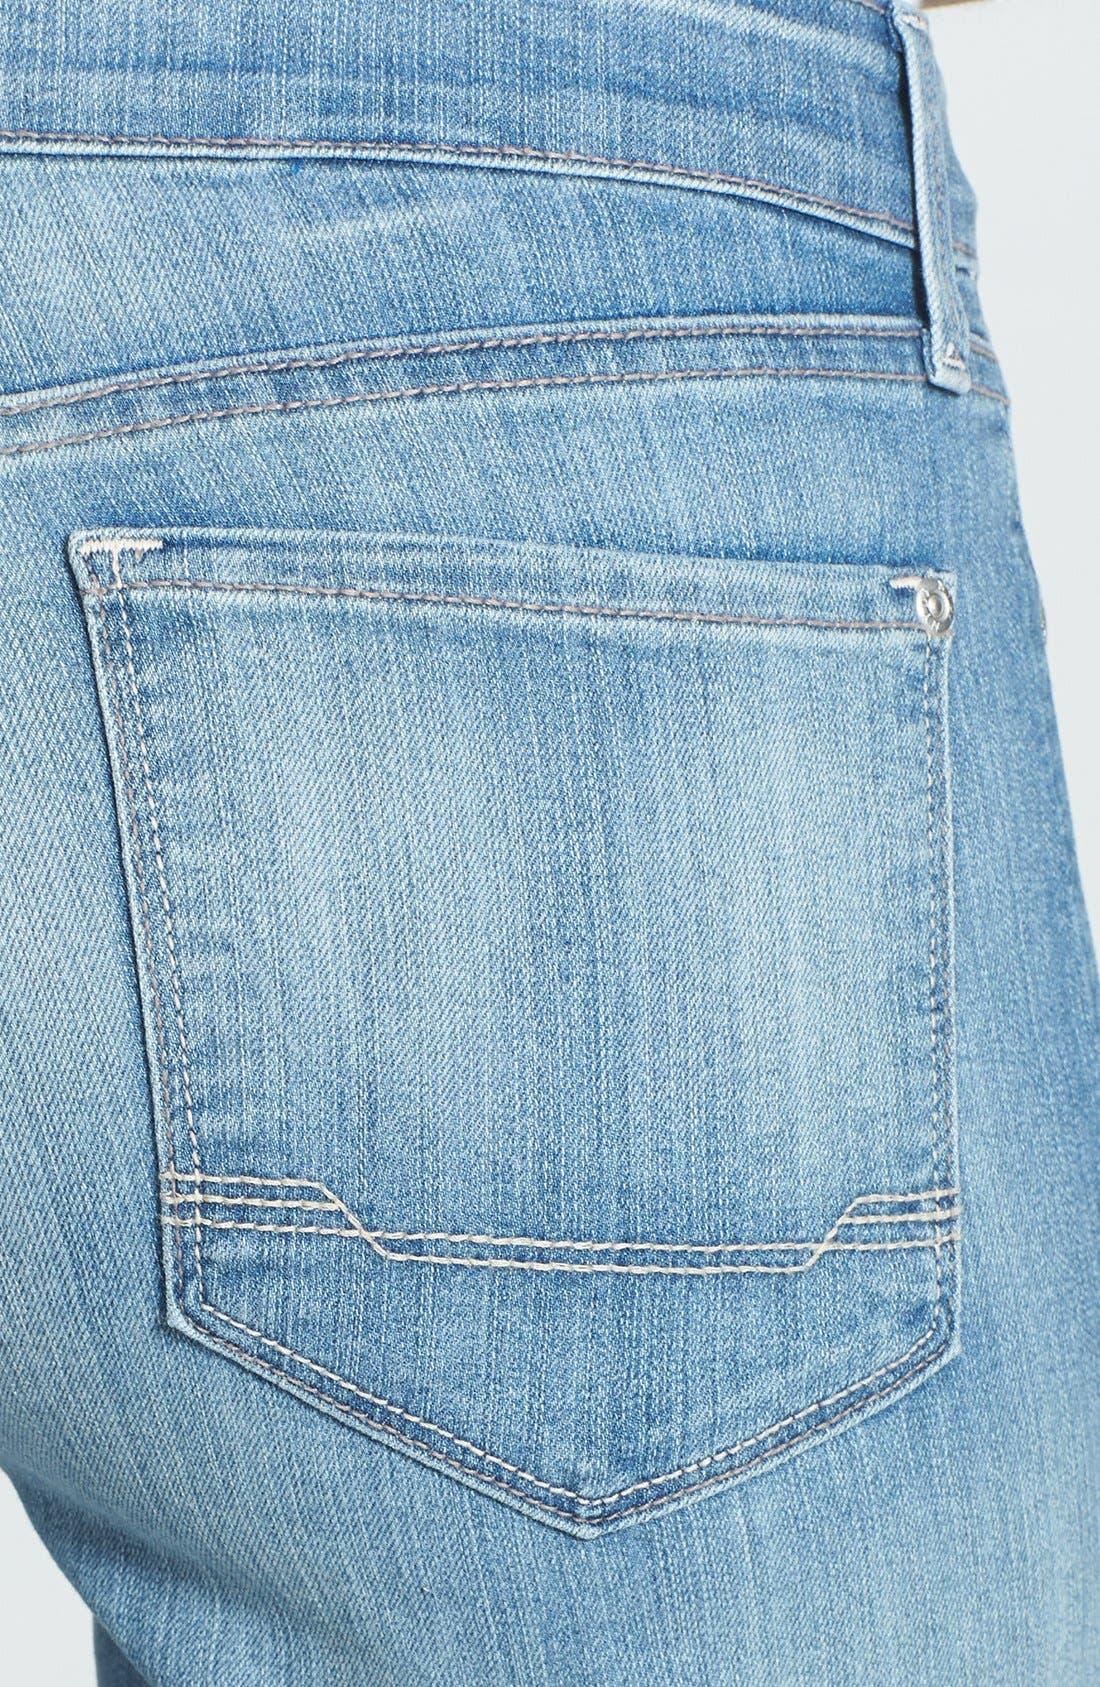 Alternate Image 3  - NYDJ 'Sheri' Stretch Skinny Jeans (Manhattan Beach)